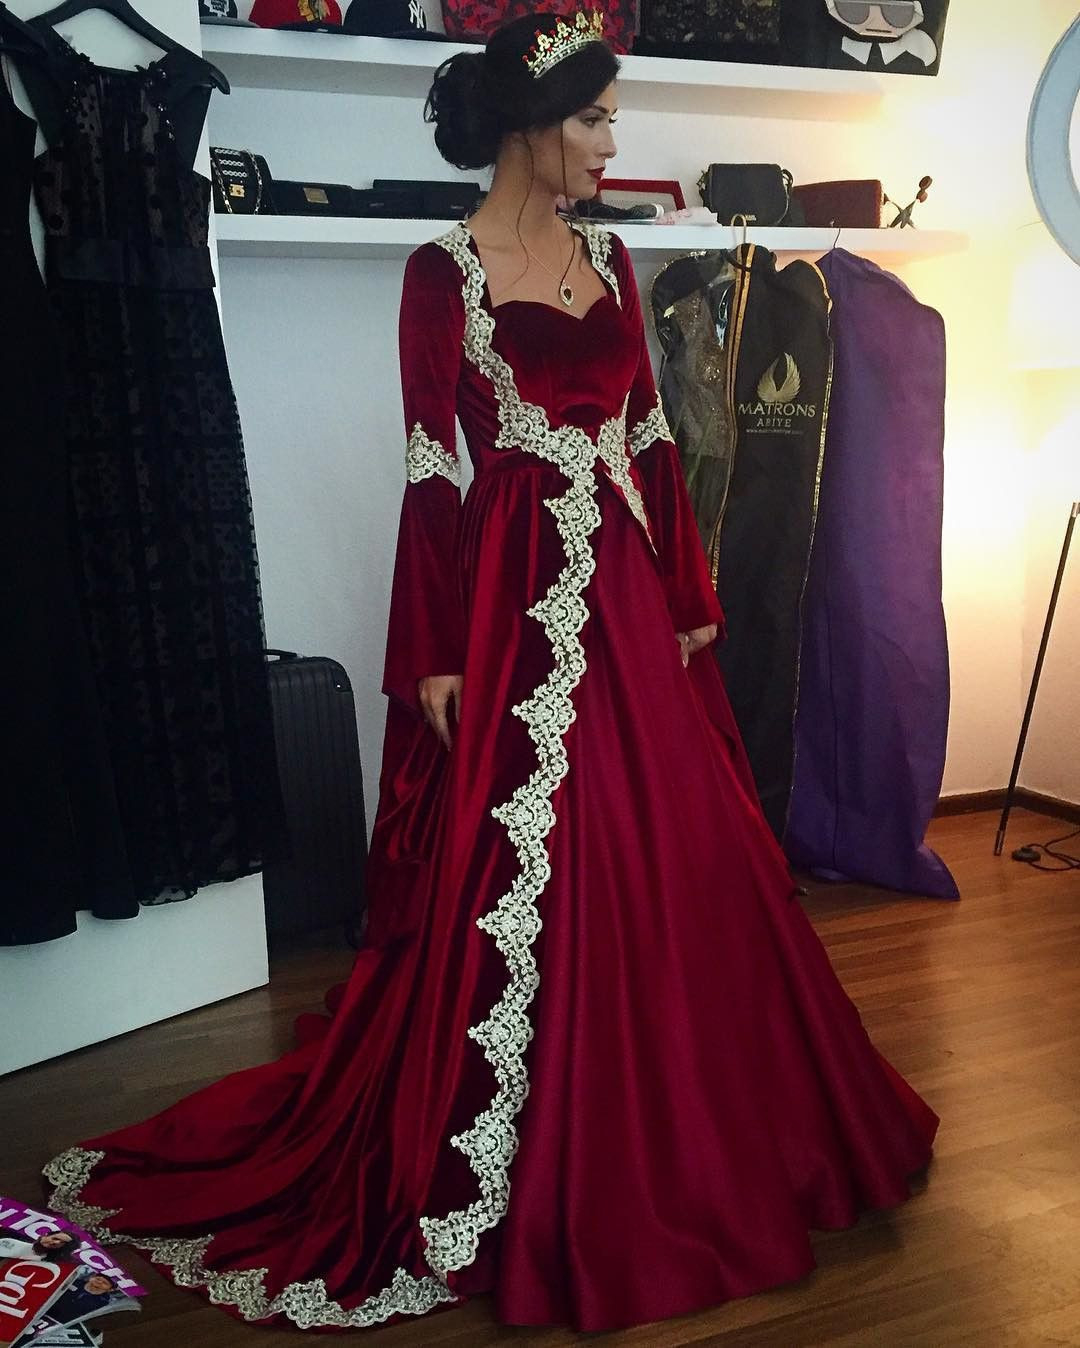 Designer Genial Henna Abend Kleid Rot Stylish10 Genial Henna Abend Kleid Rot Galerie